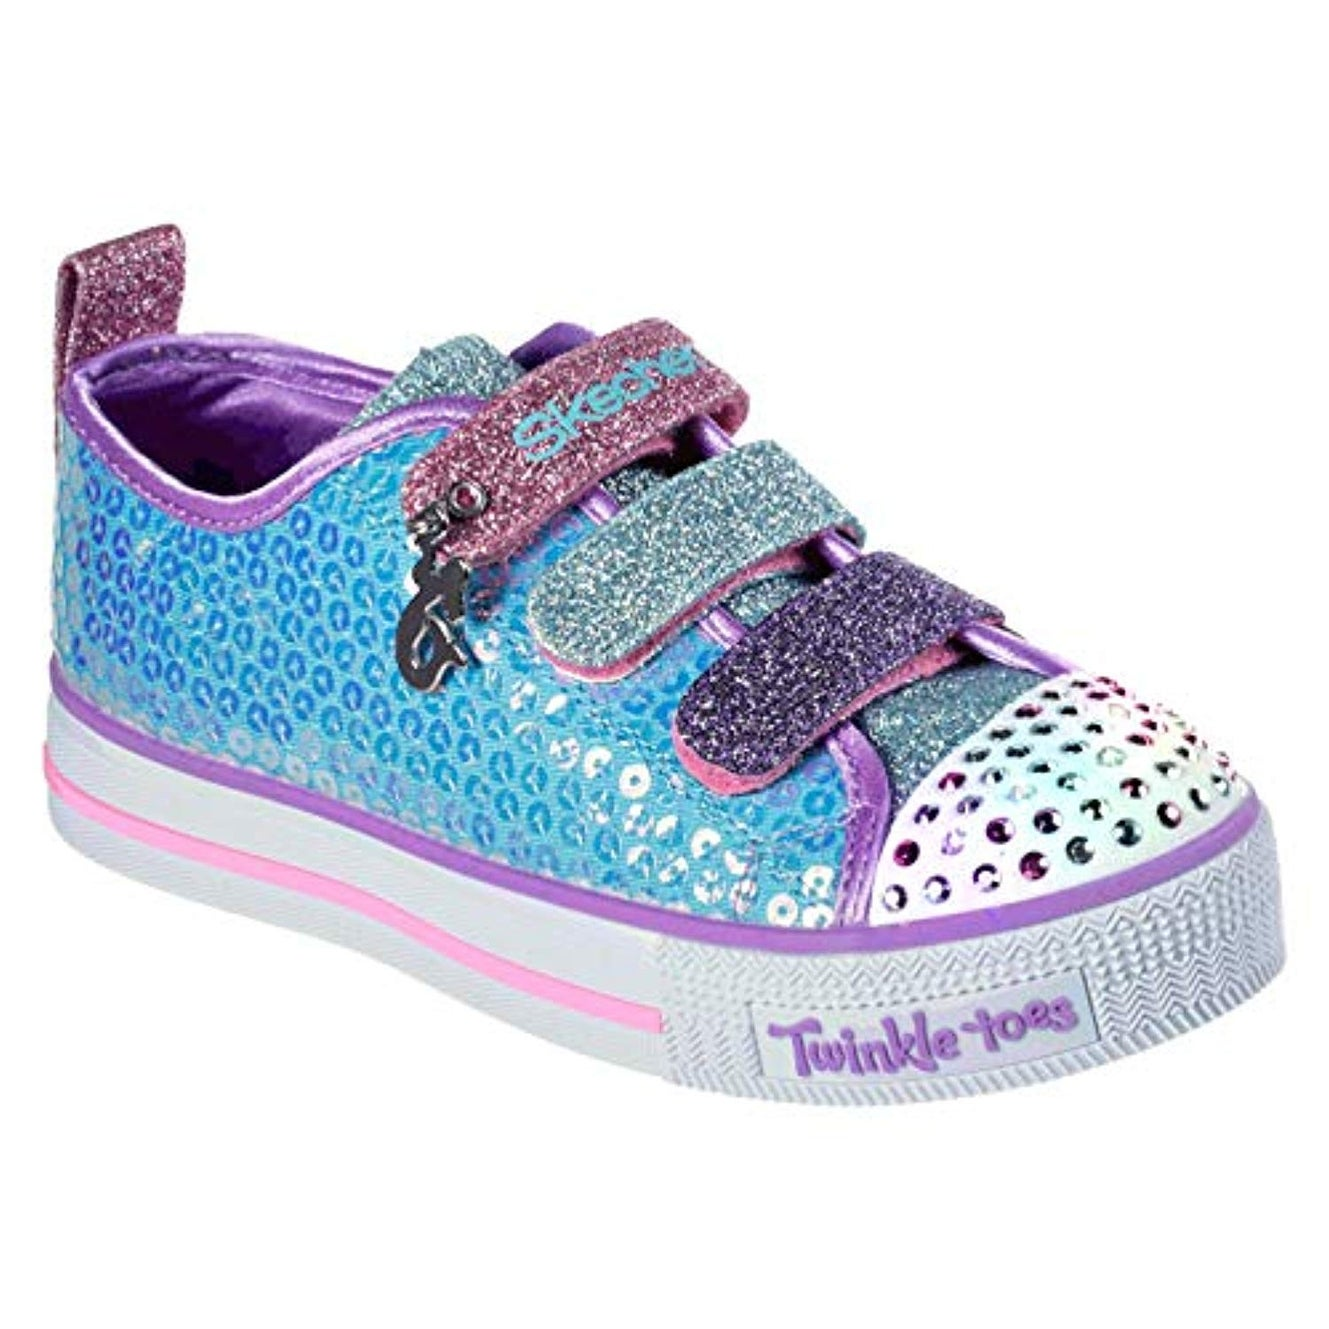 Skechers Kids Girls' Twinkle Lite Mermaid Magic Sneaker, TurquoiseMulti, 3 Medium Us Little Kid